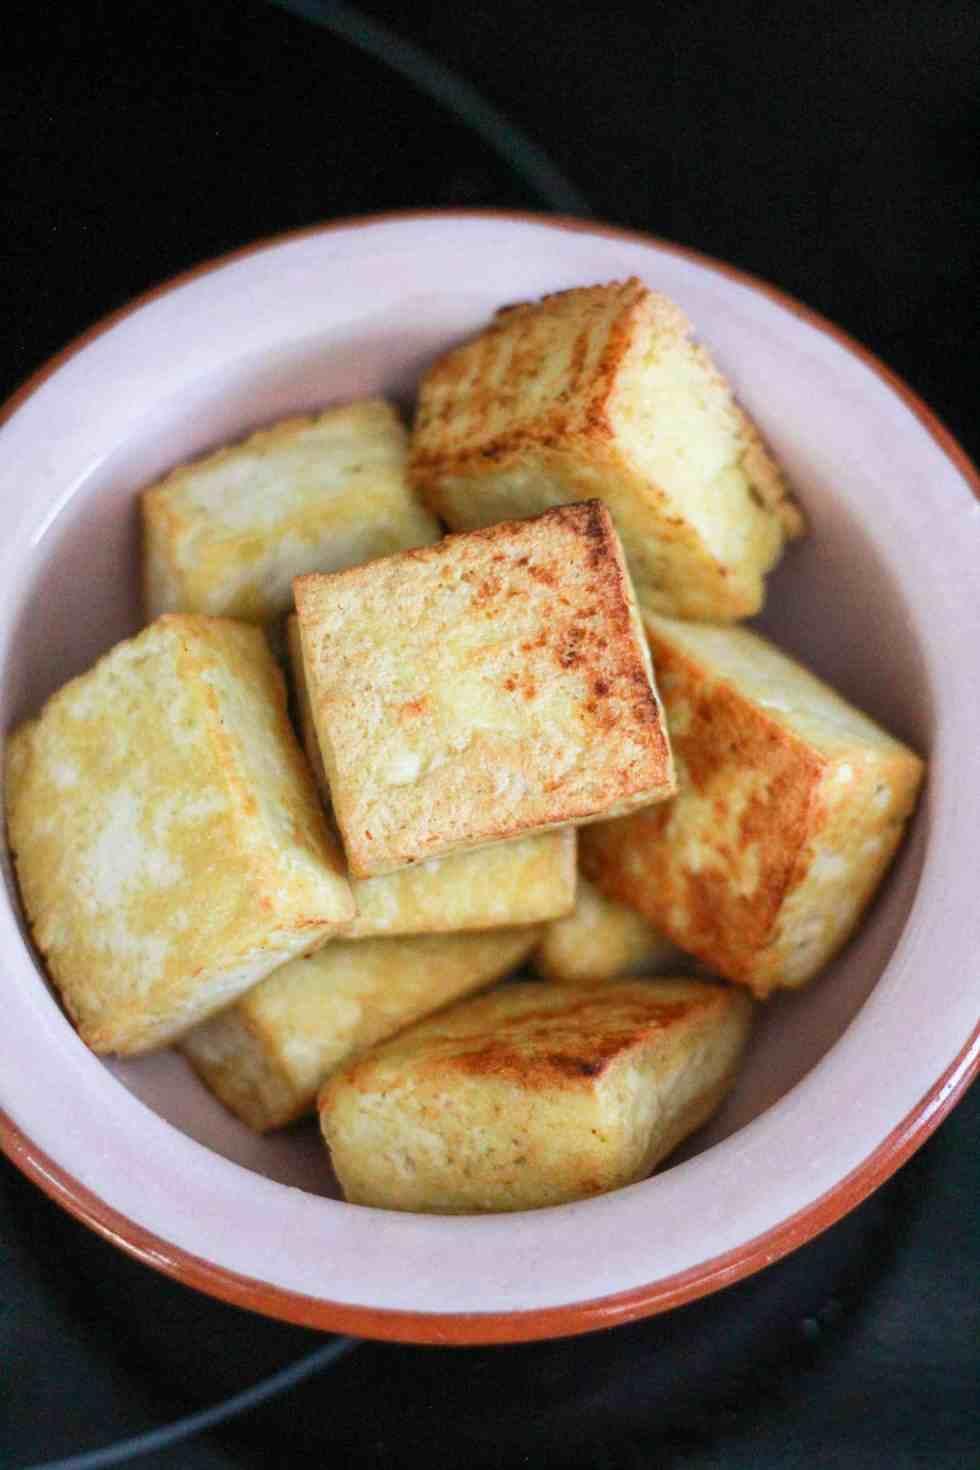 Pan-fried tofu in a pink bowl.